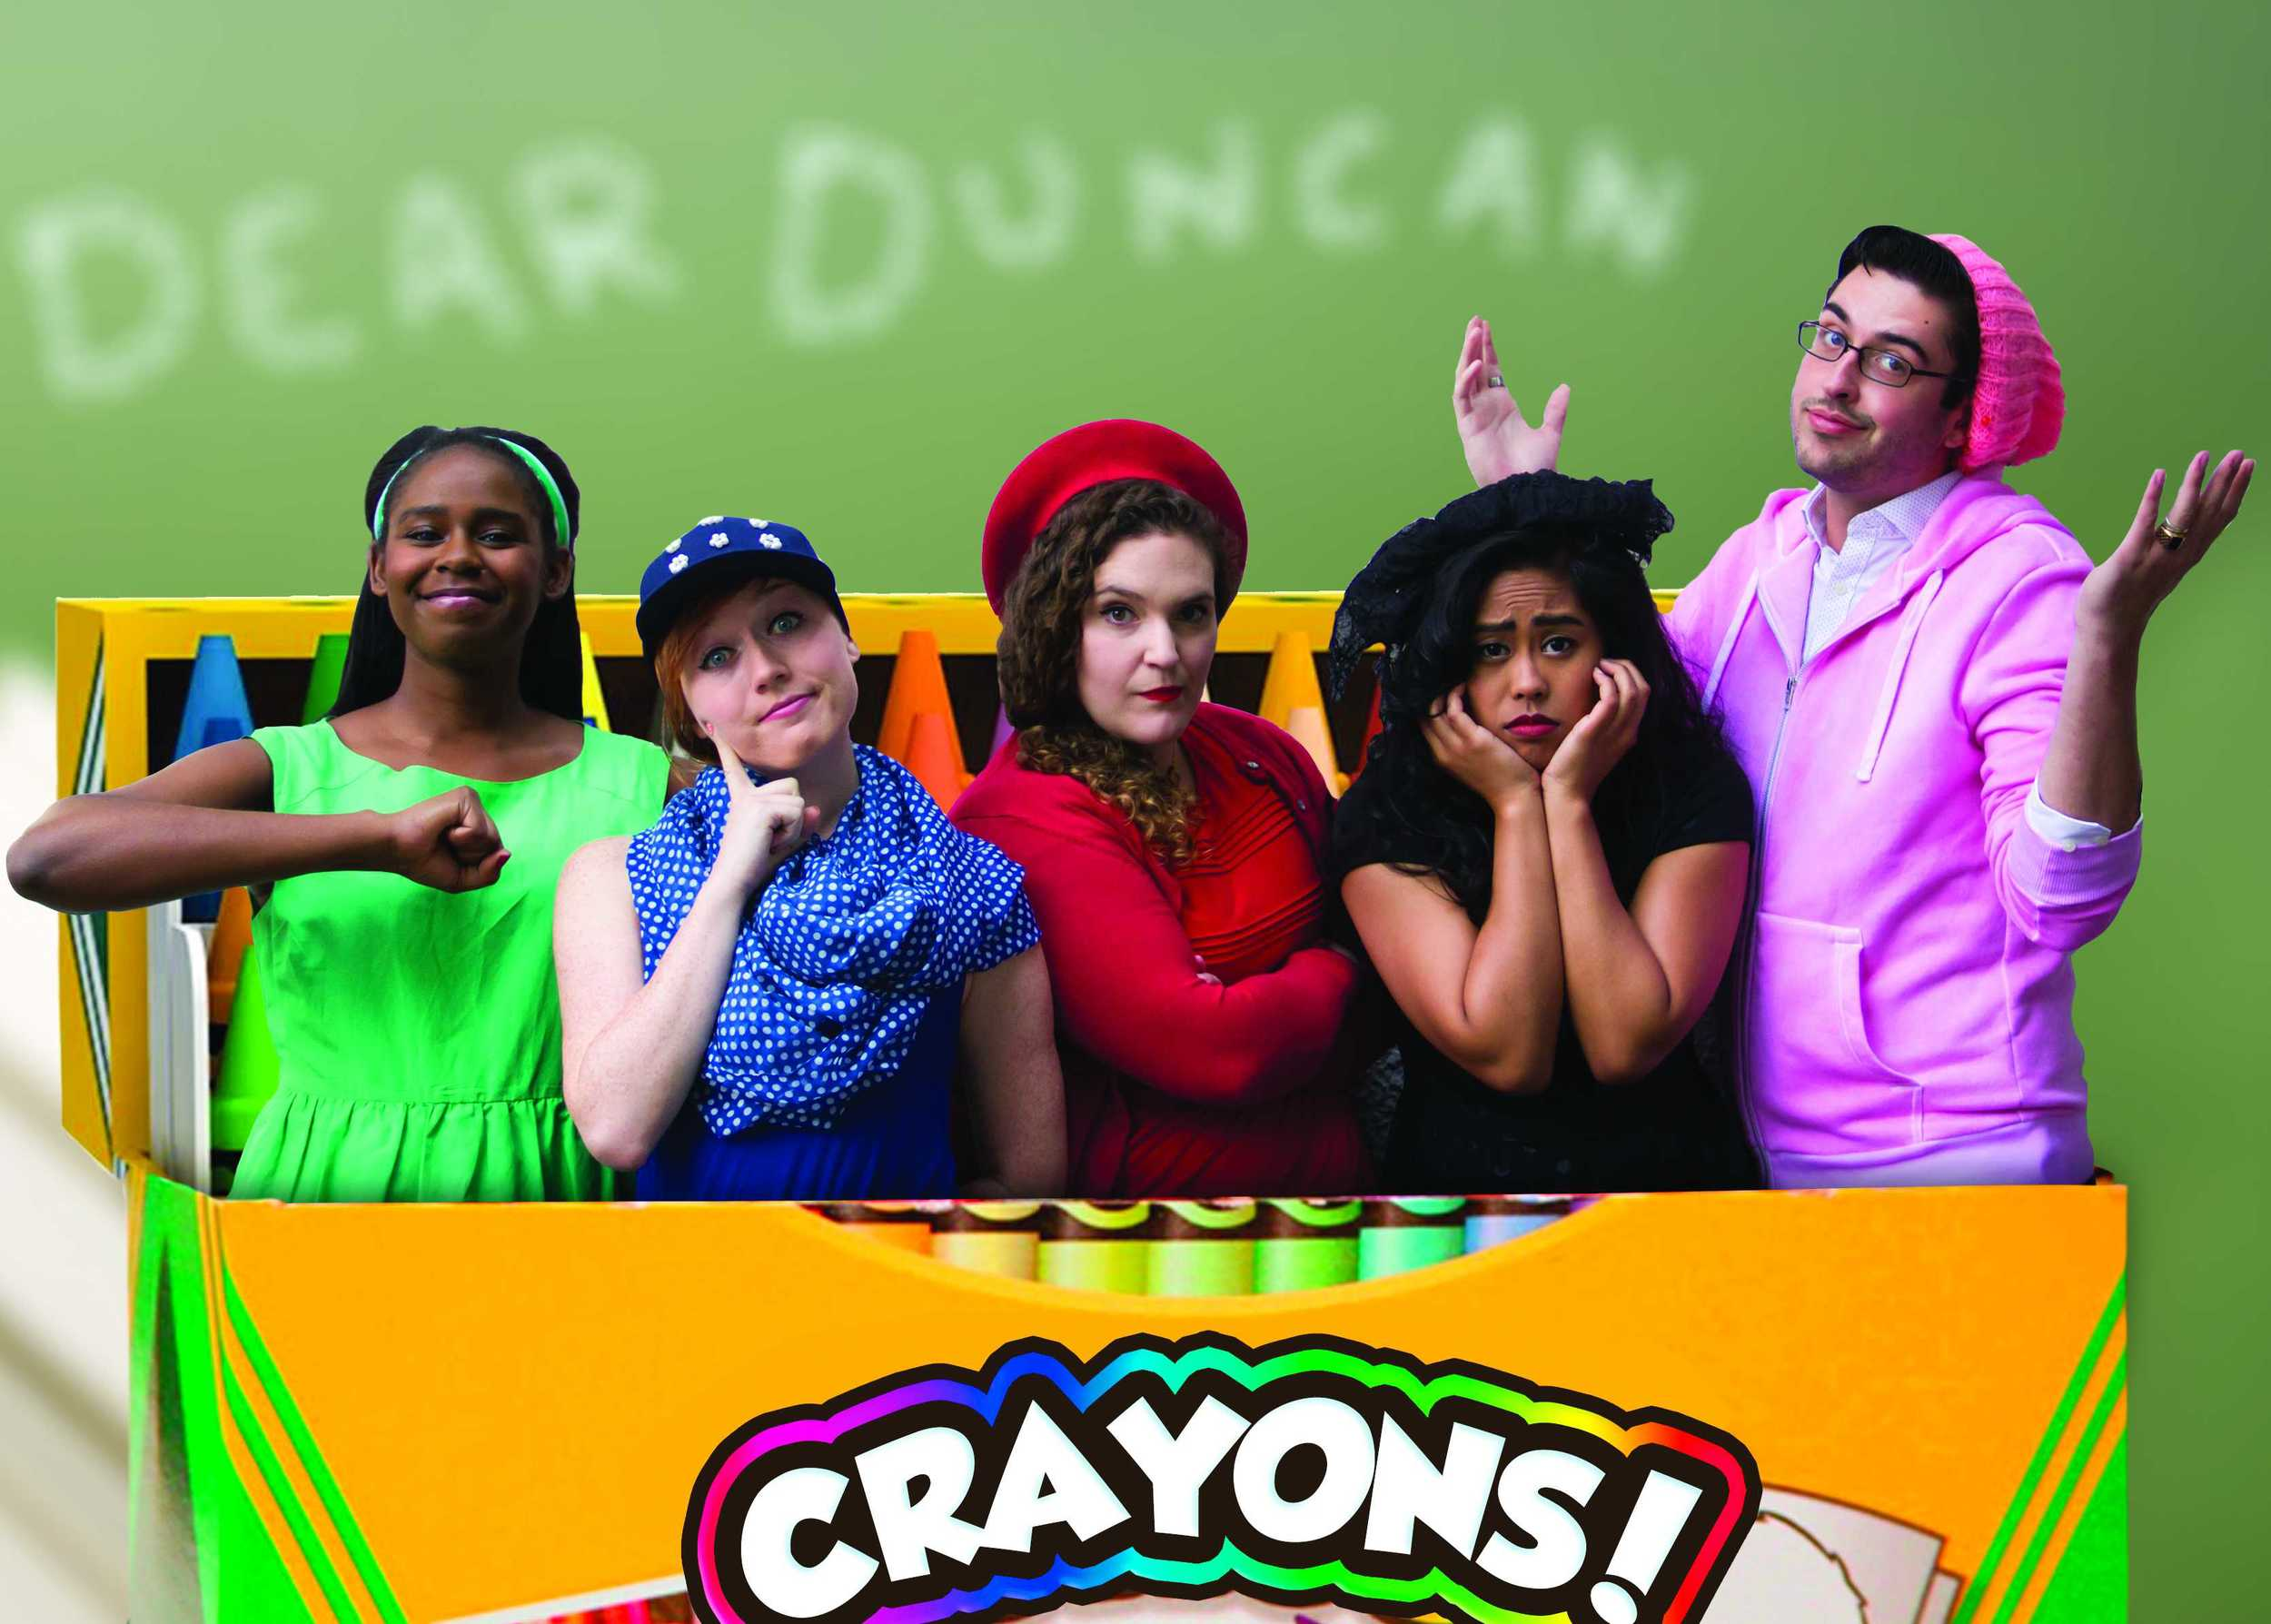 Jacqueline Dennis as Green,  Chloe Condon as Blue, Anna Smith as Red,    Carina Salazar as Black, and Brett Jones as Pink